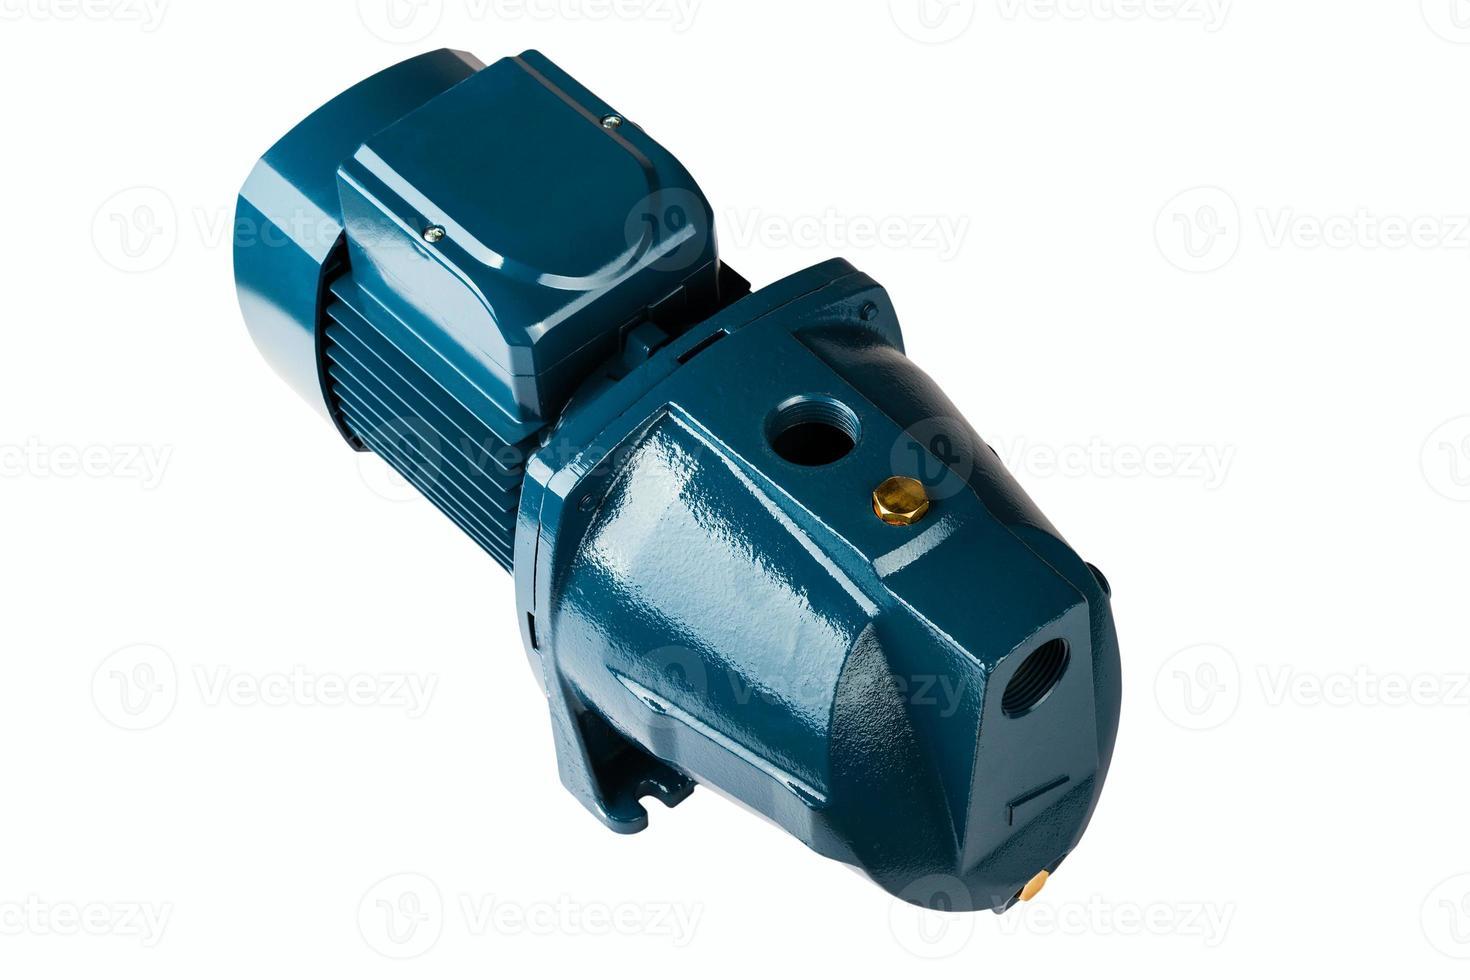 bomba de água foto